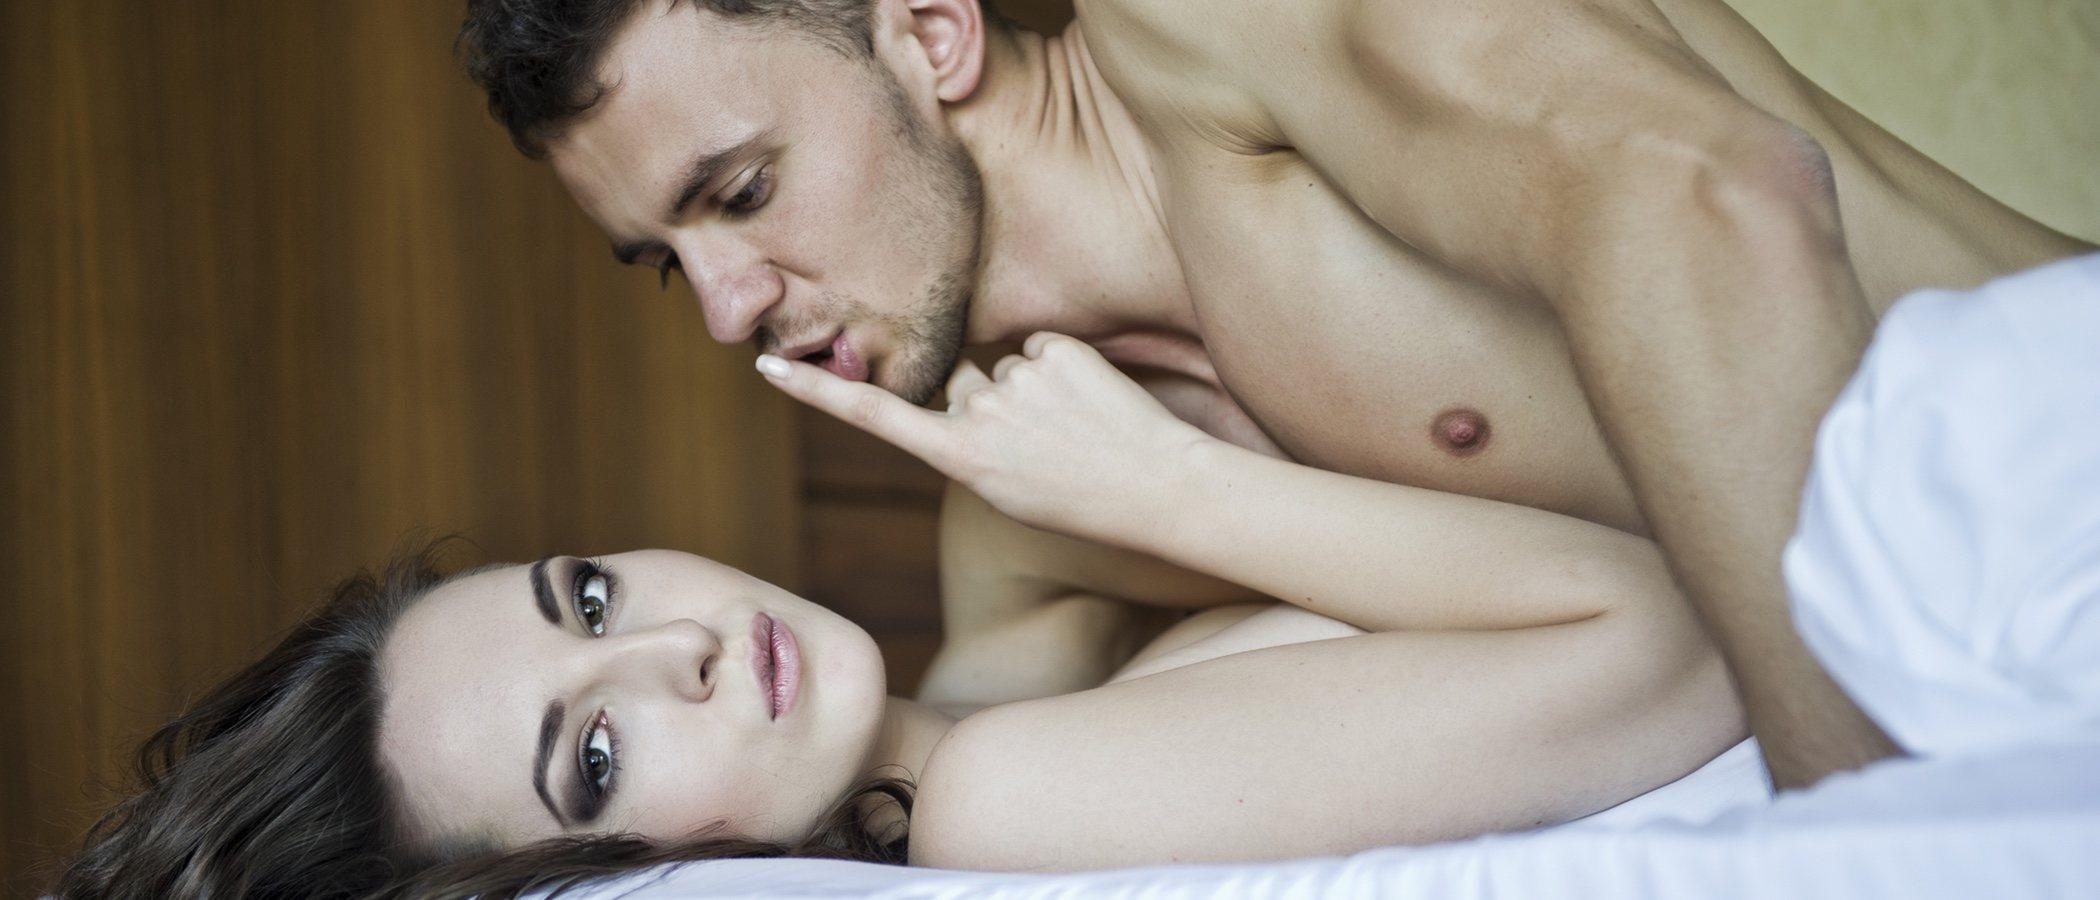 Horóscopo sexual febrero 2020: Cáncer